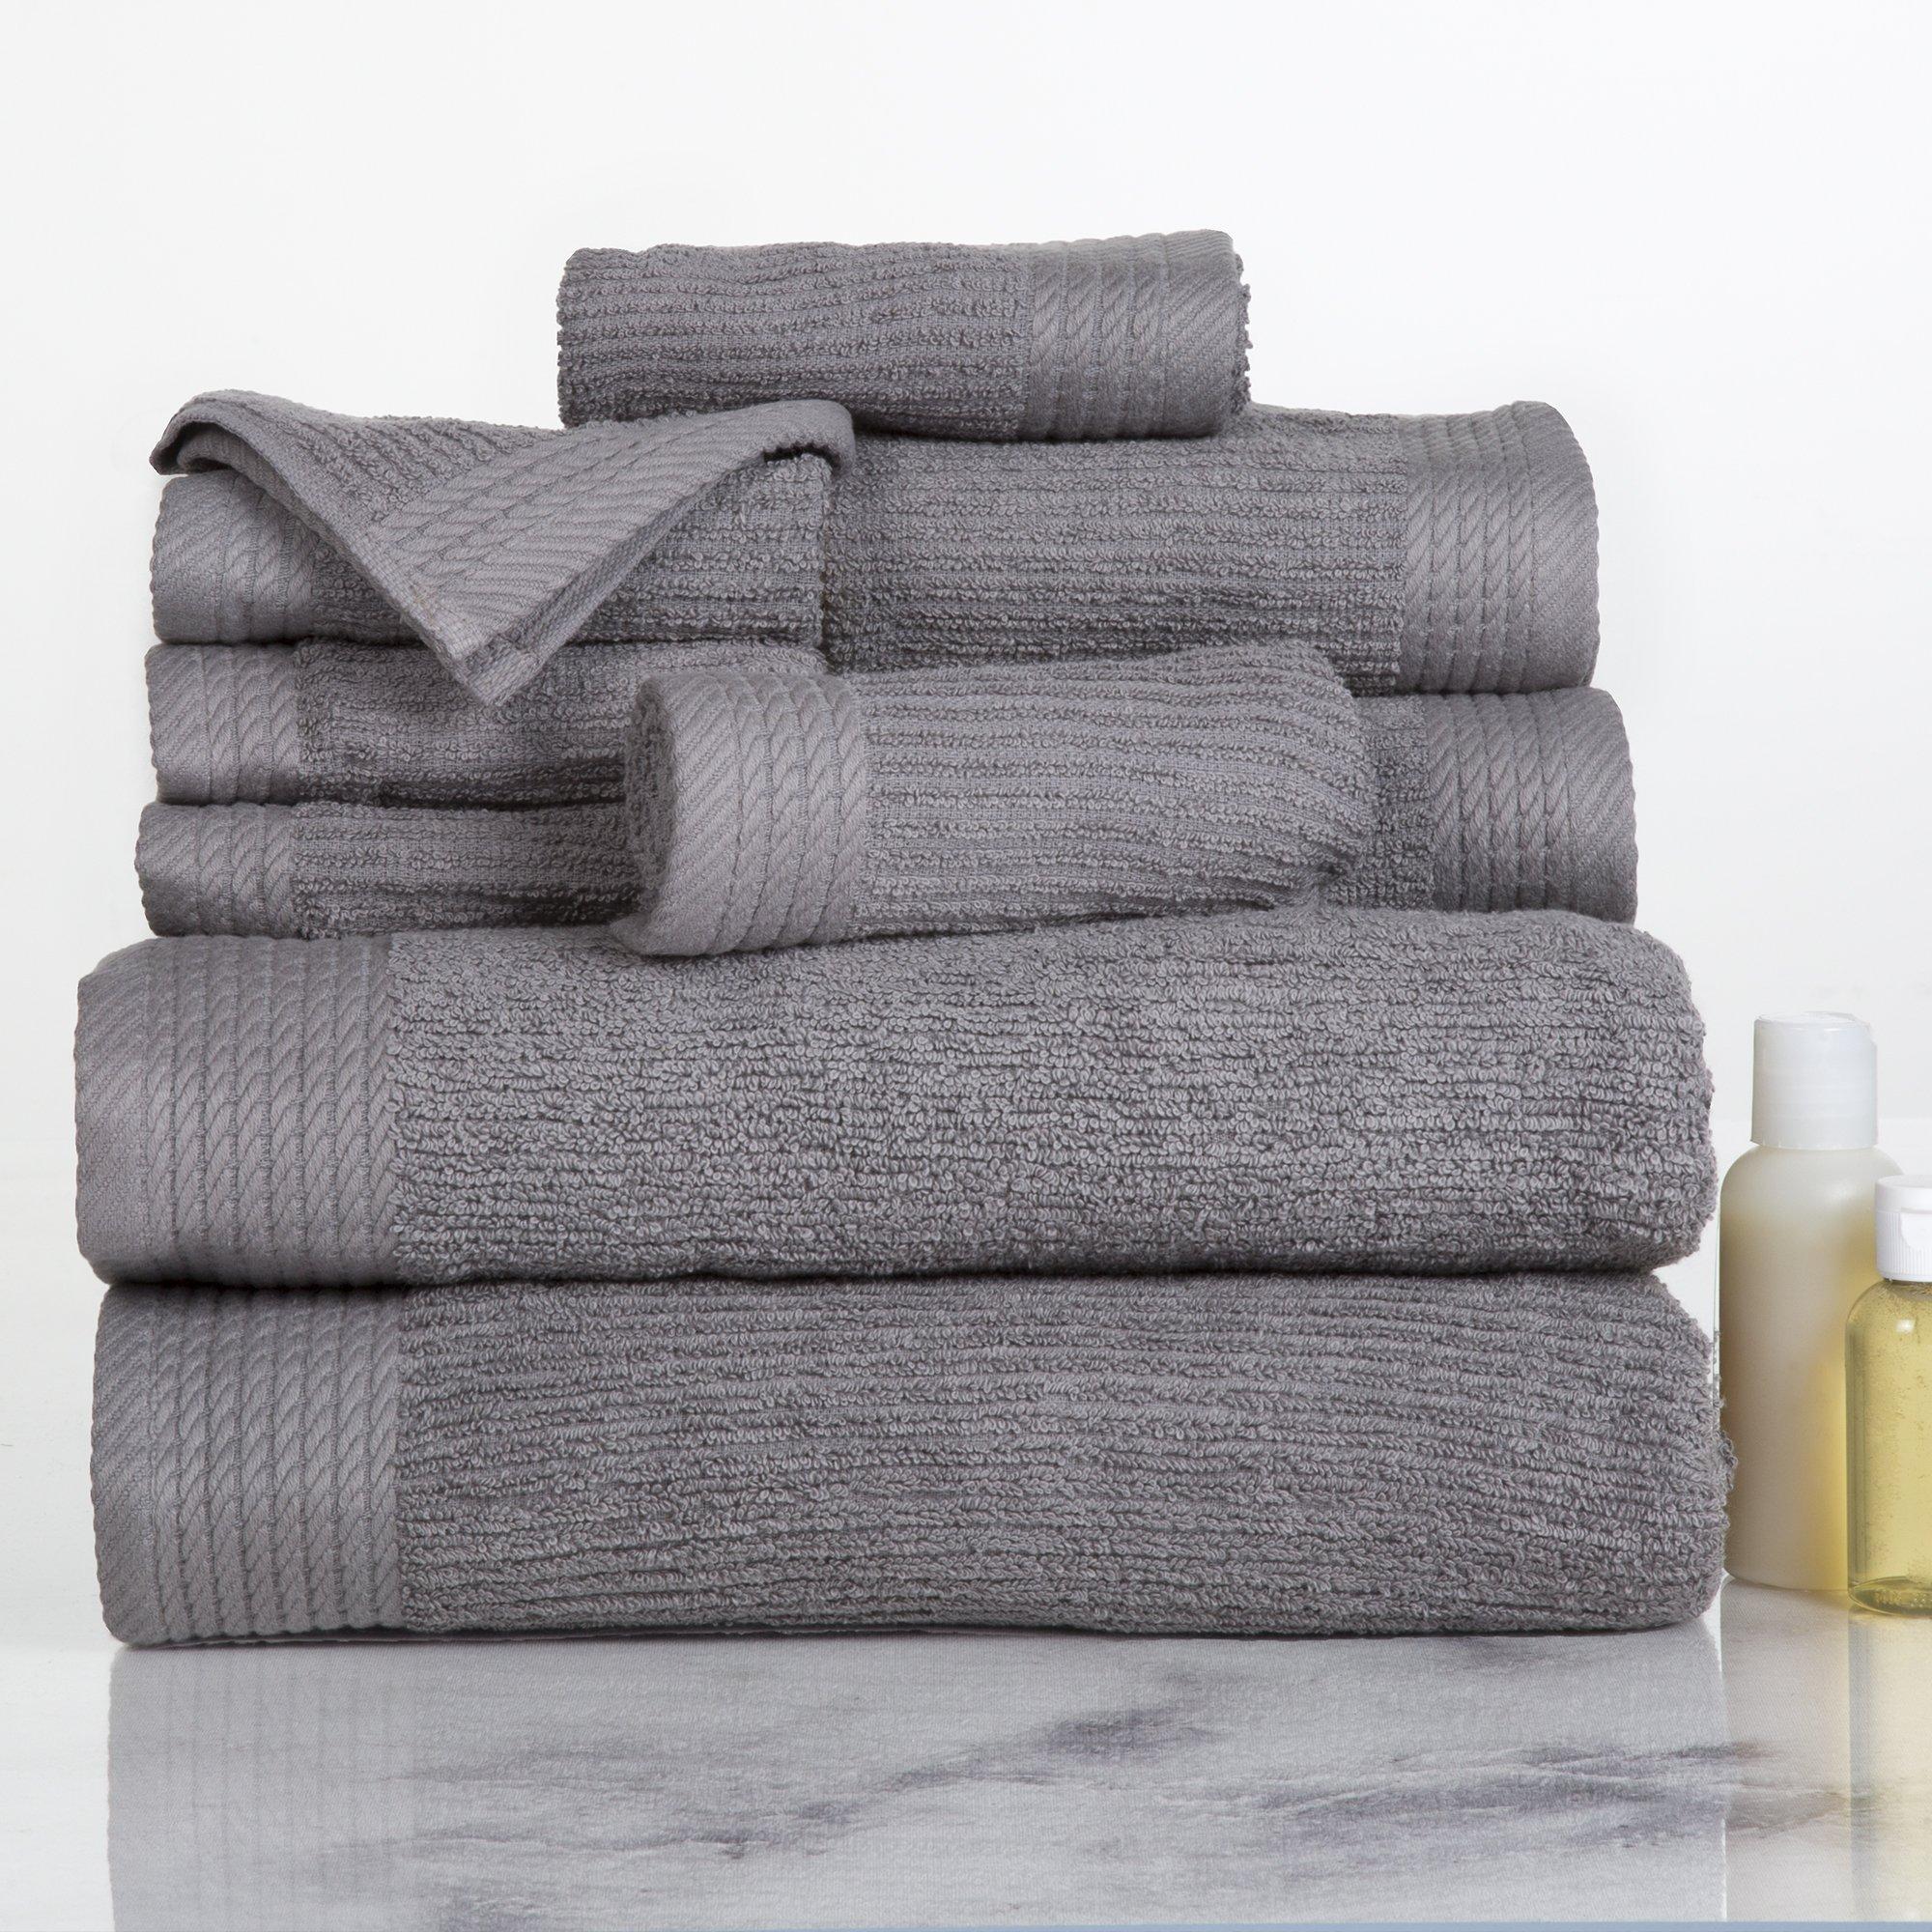 Lavish Home Ribbed 100% Cotton 10 Piece Towel Set - Silver